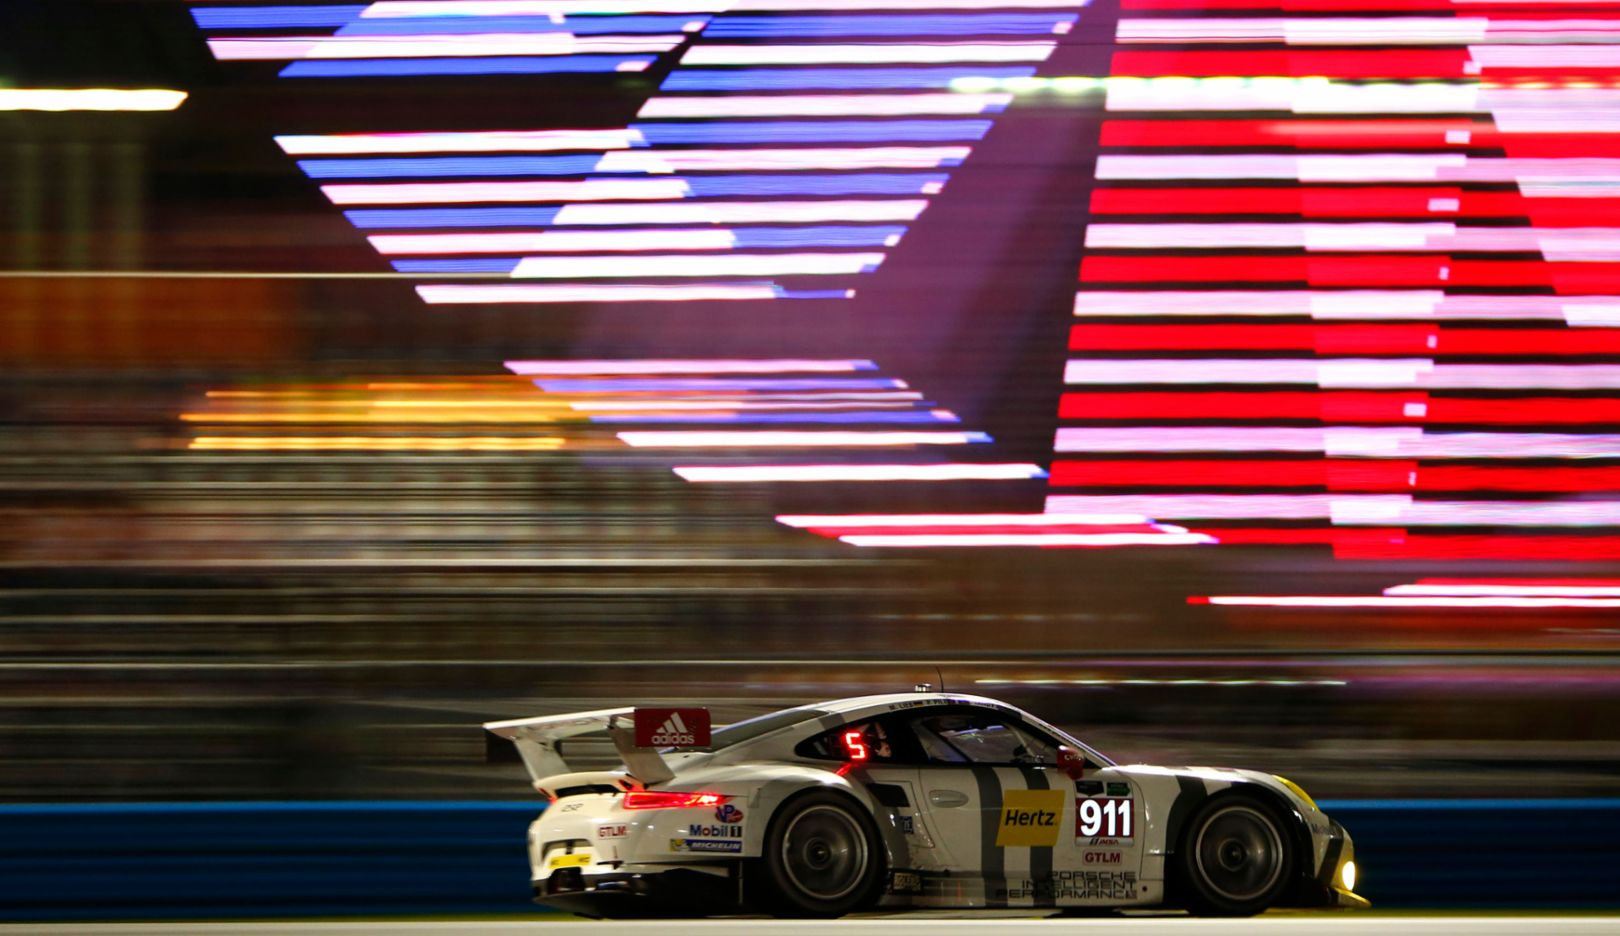 911 RSR, Daytona, 2015, Porsche AG